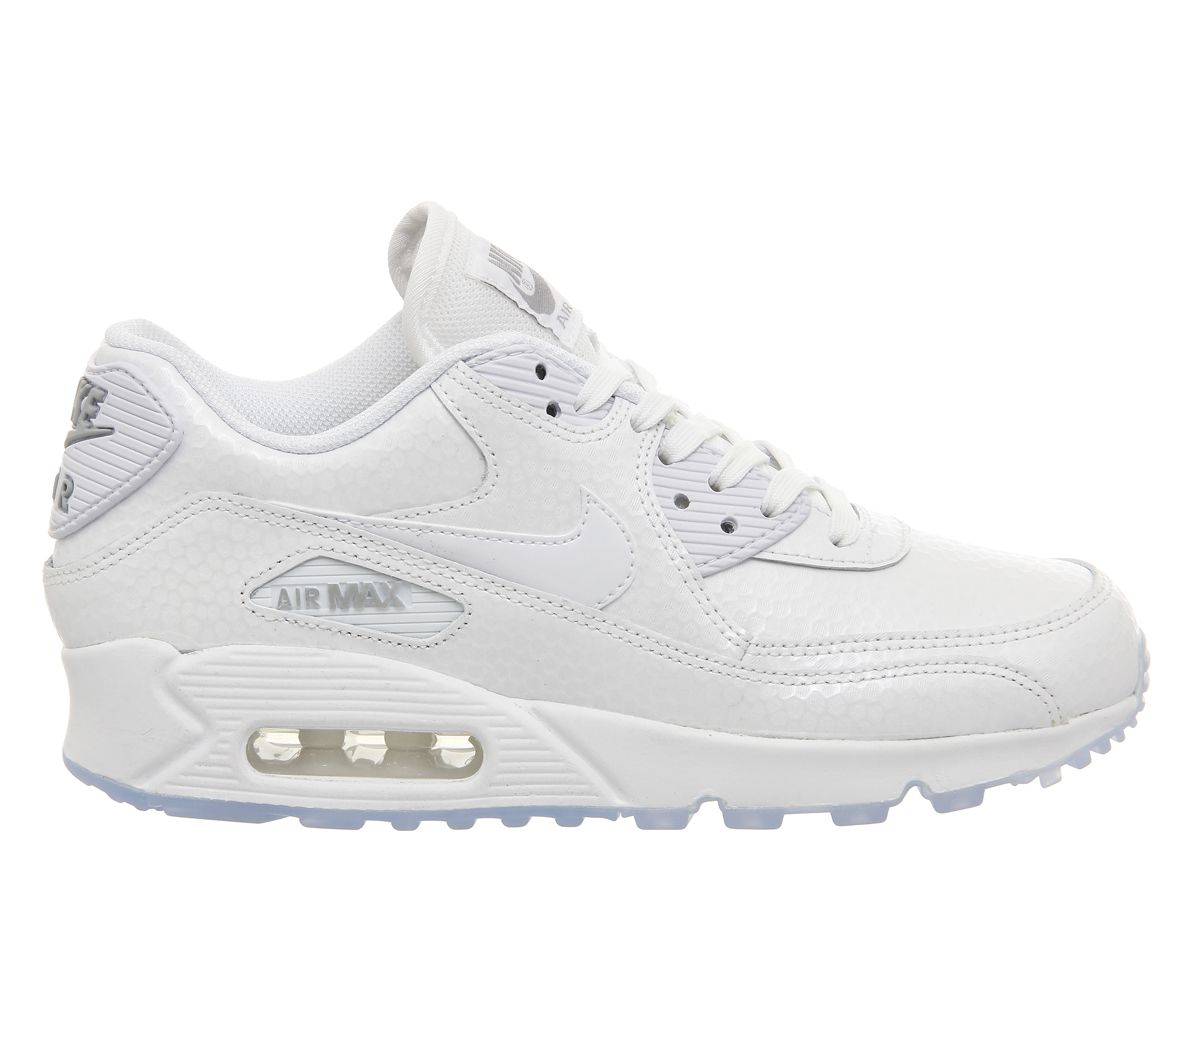 semelle vans - Nike Air Max 90 Pearl Pack (w) White Metallic Silver - Hers ...